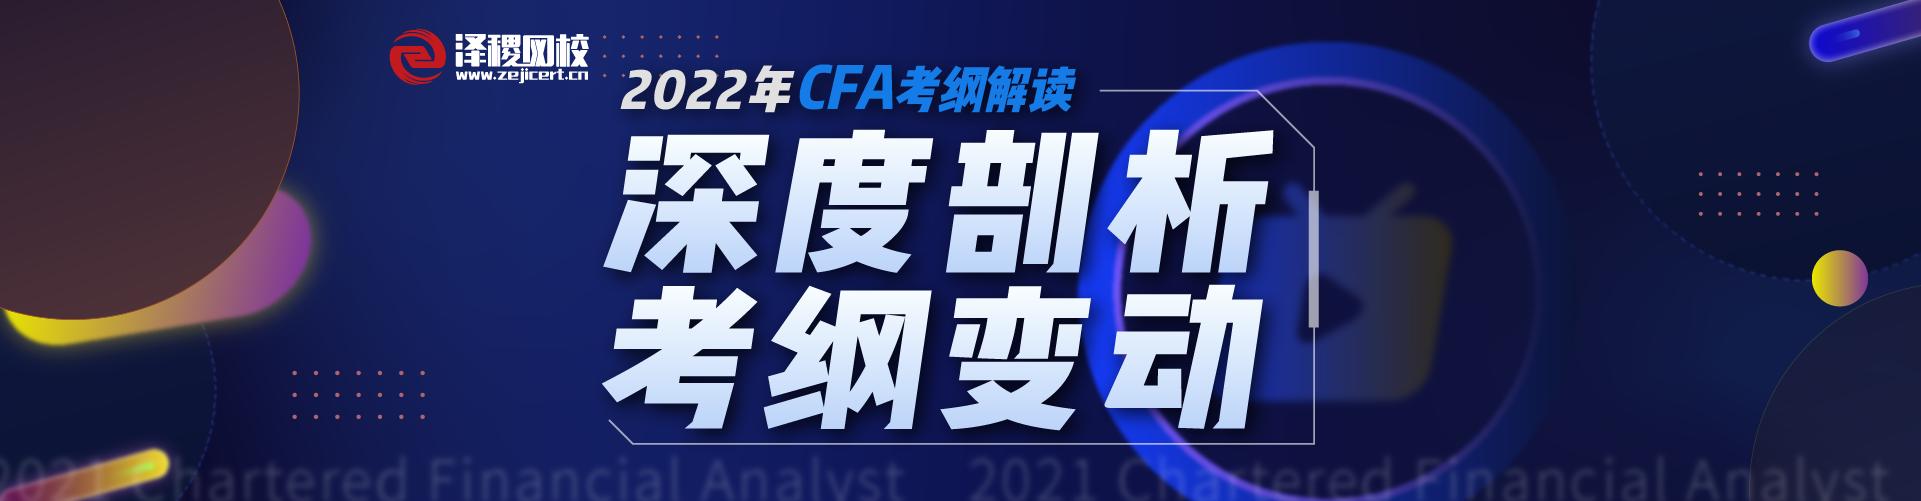 CFA考纲变化